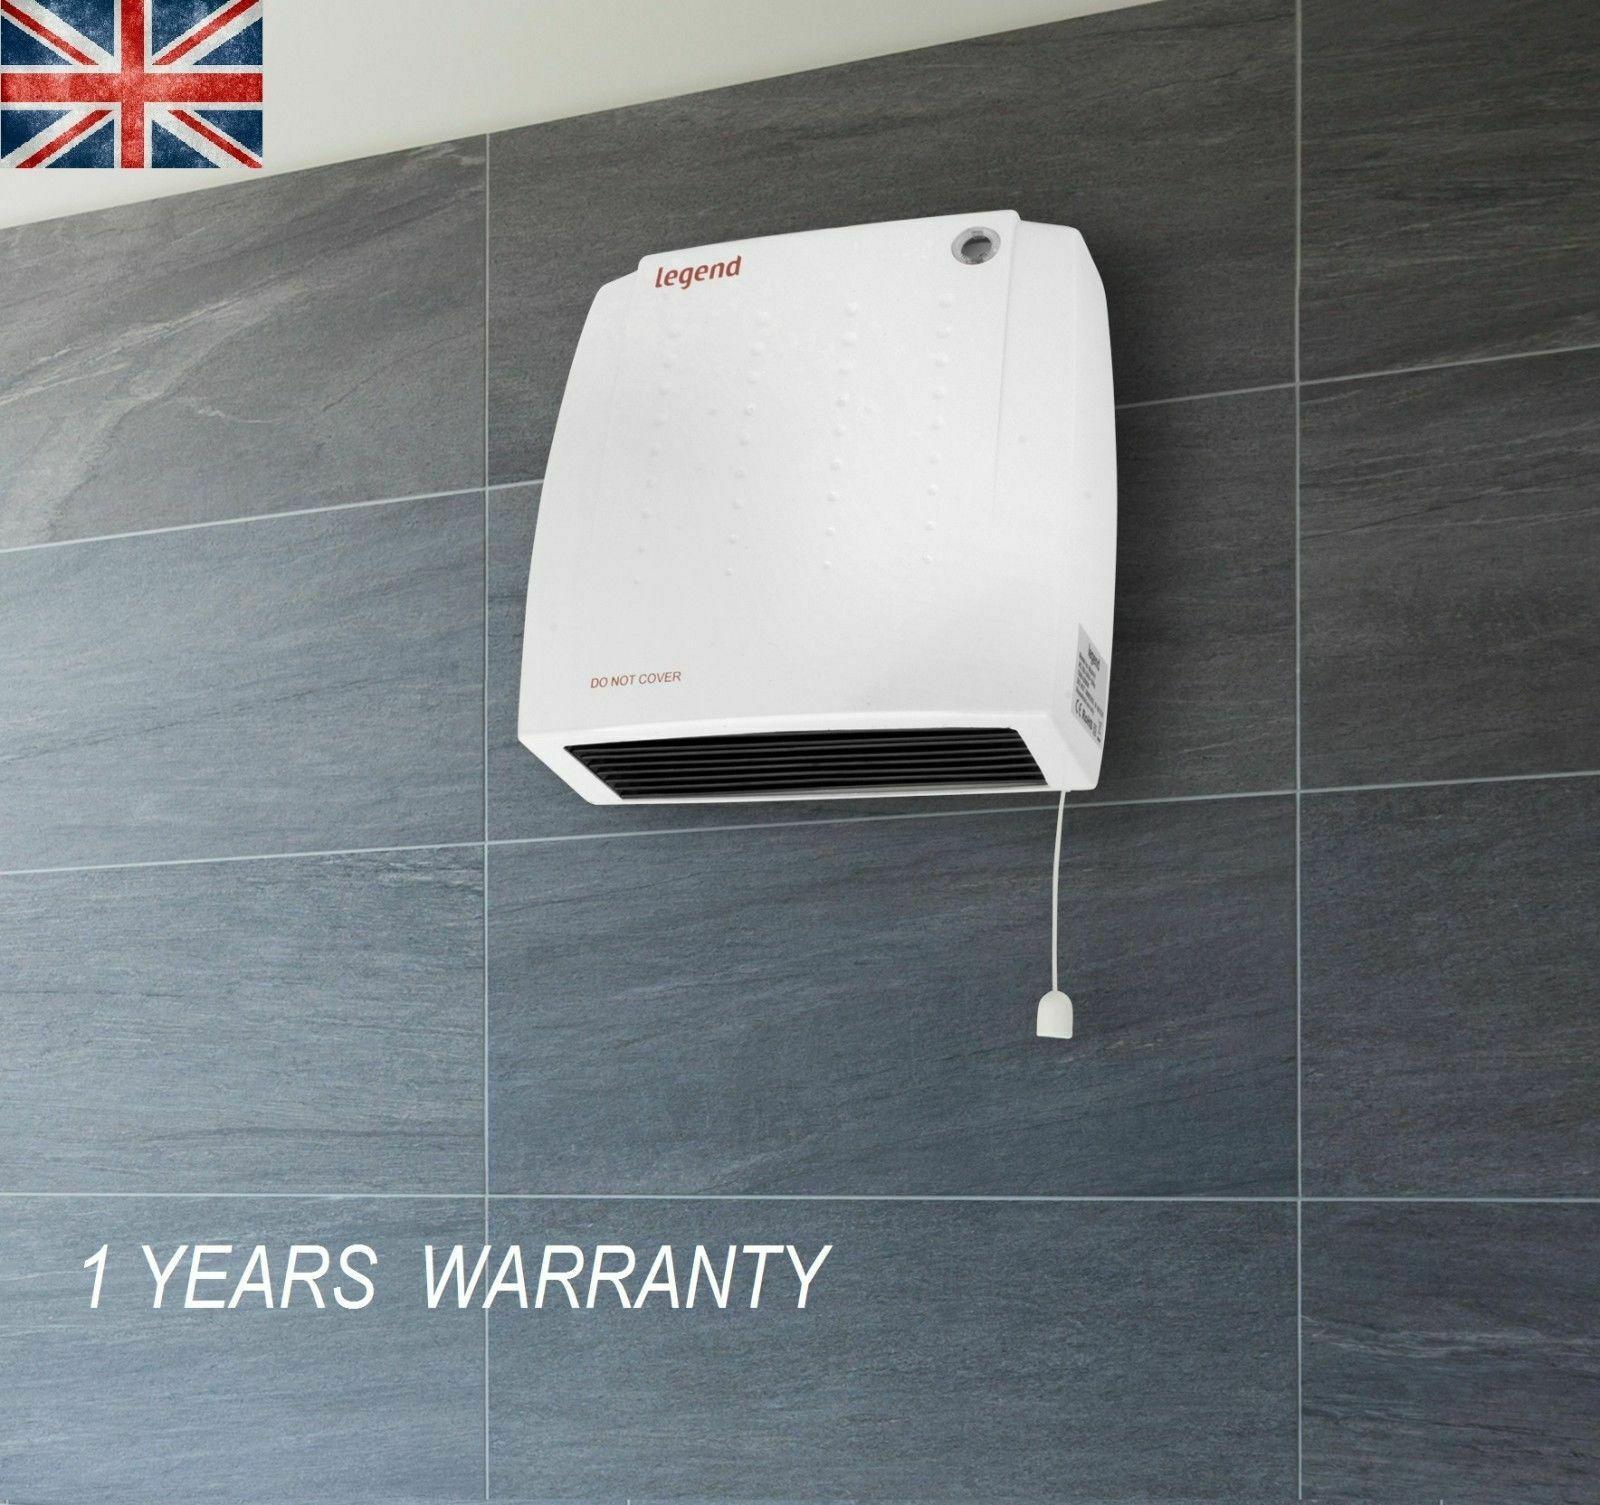 Heating Cooling Glen 2 Kw Wall Mounted Downflow Fan Heater for size 1600 X 1505